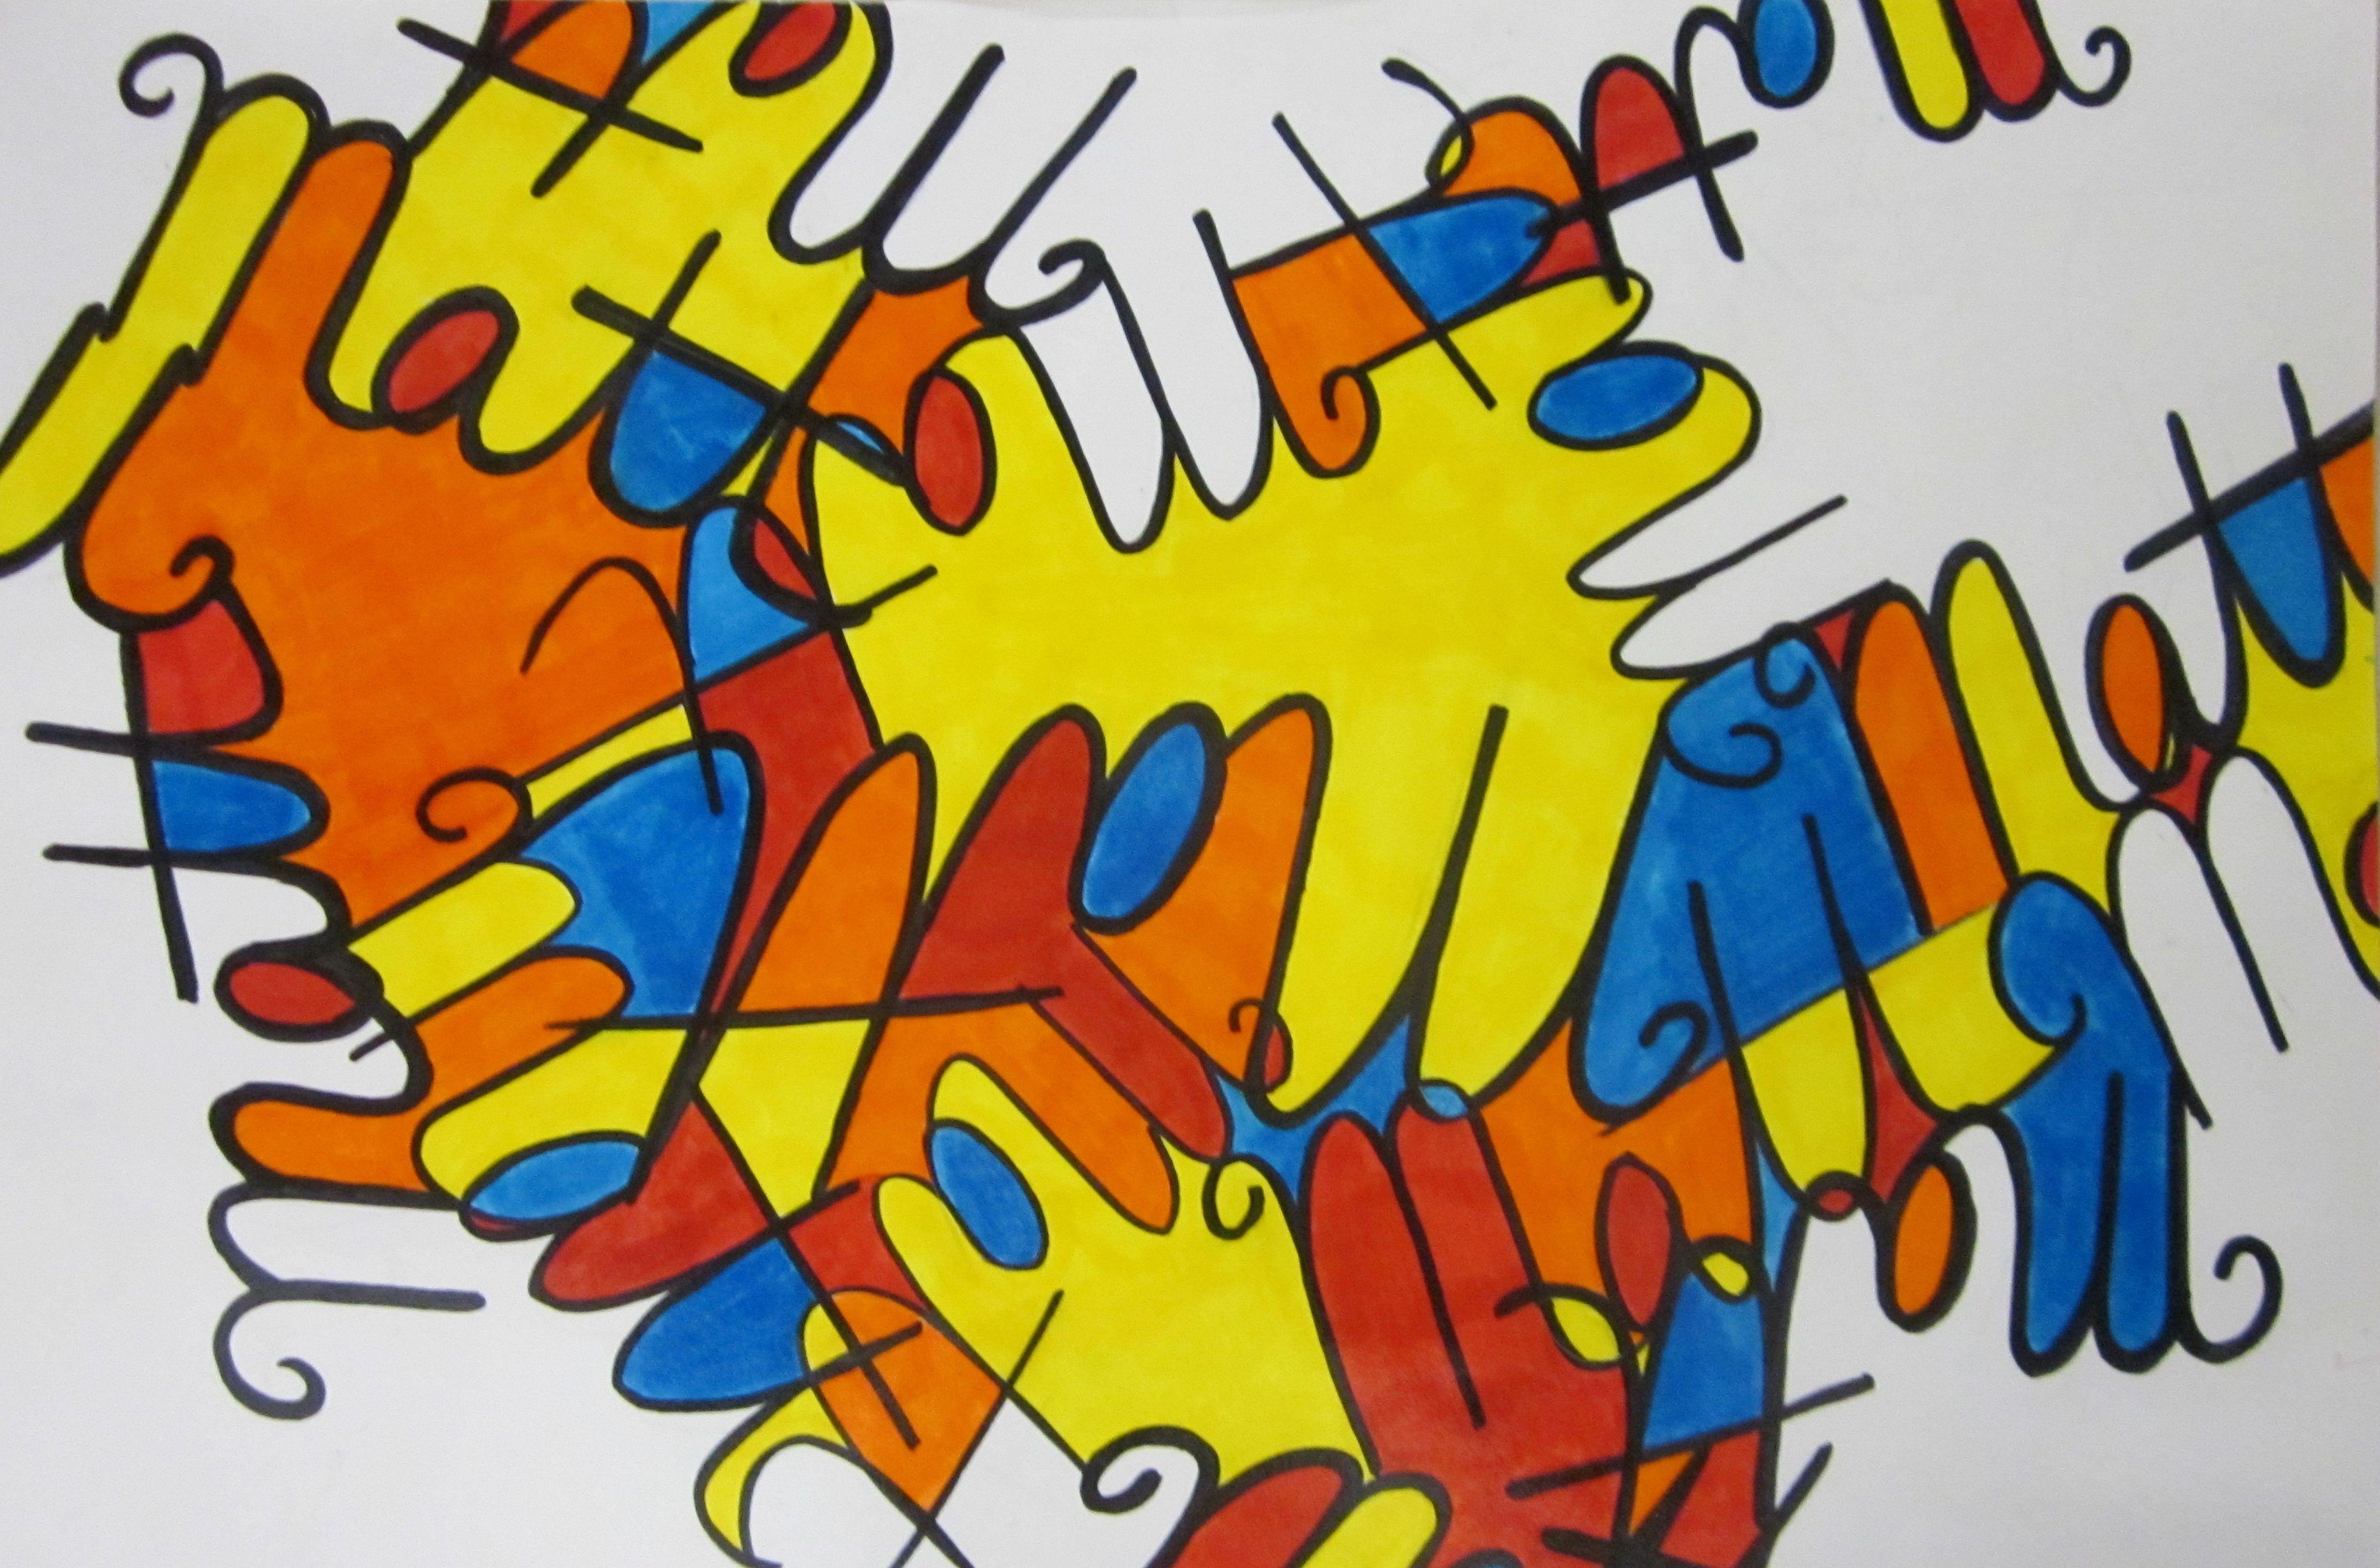 Cursive Name Project/ Middle School Sub Lesson | Art Lesson Ideas ...